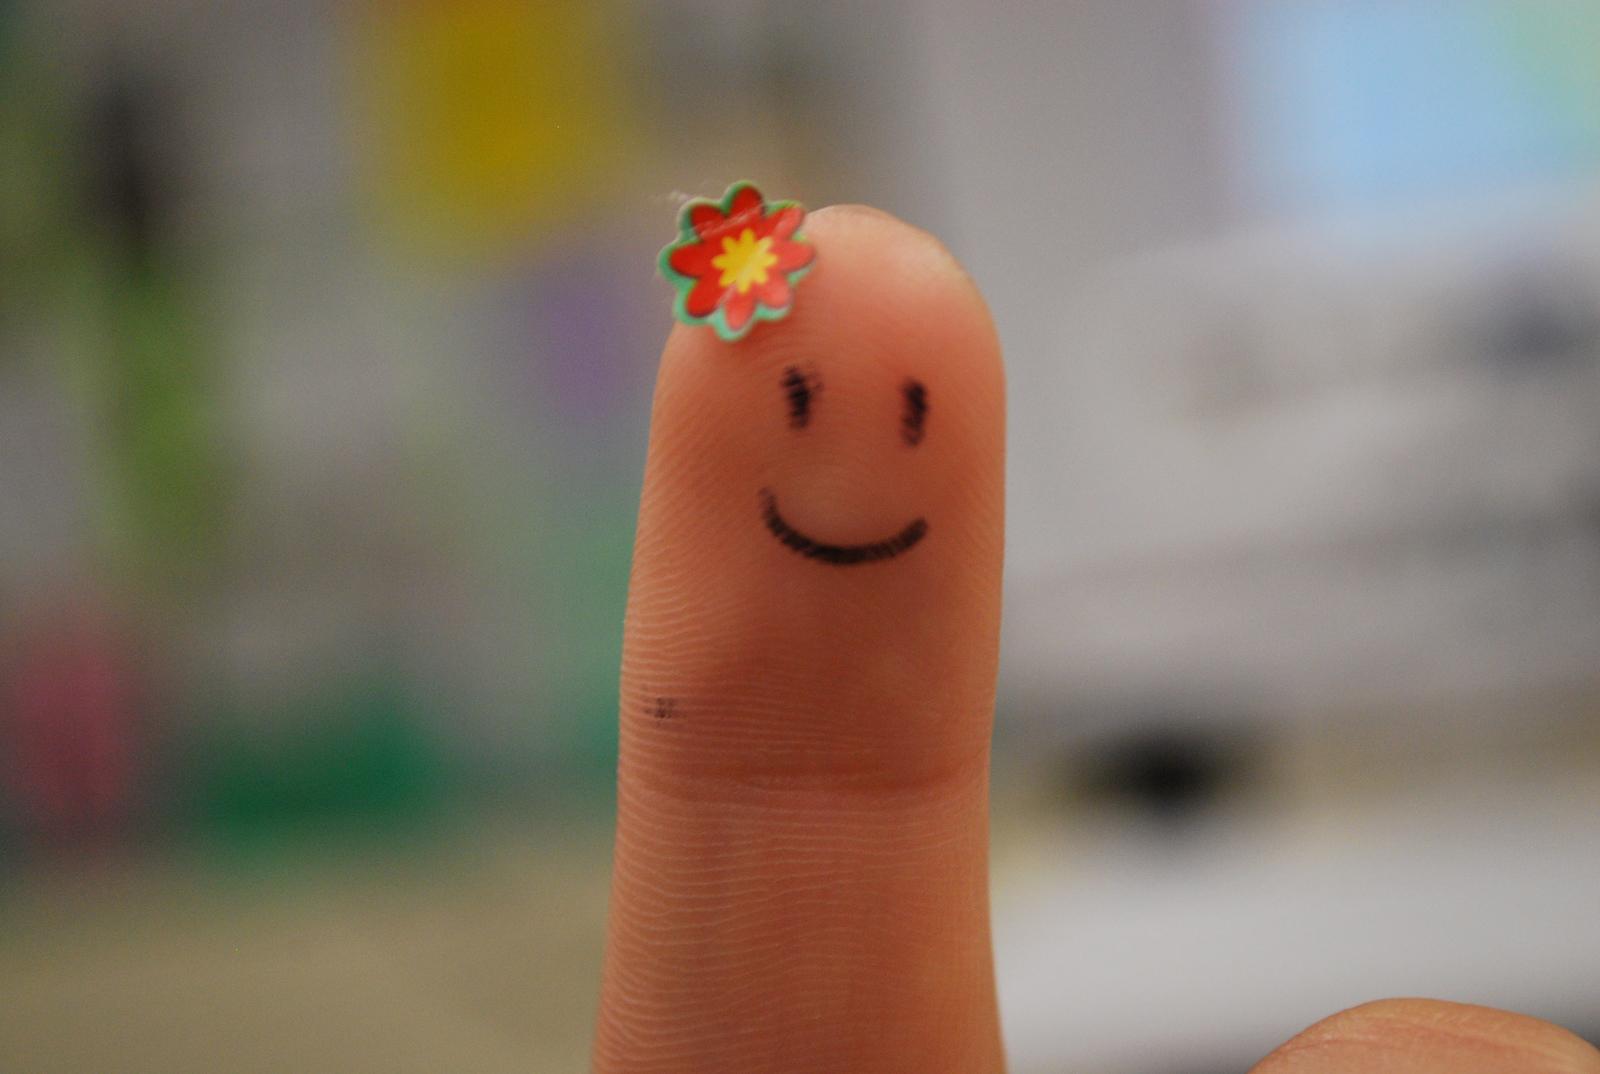 http://3.bp.blogspot.com/-_-KrNkKyIEg/ToTjd8Yv47I/AAAAAAAABcw/U2-wl34Ac3I/s1600/Fingers_Smile_Funny_Wallpapers_Vvallpaper.net.jpg